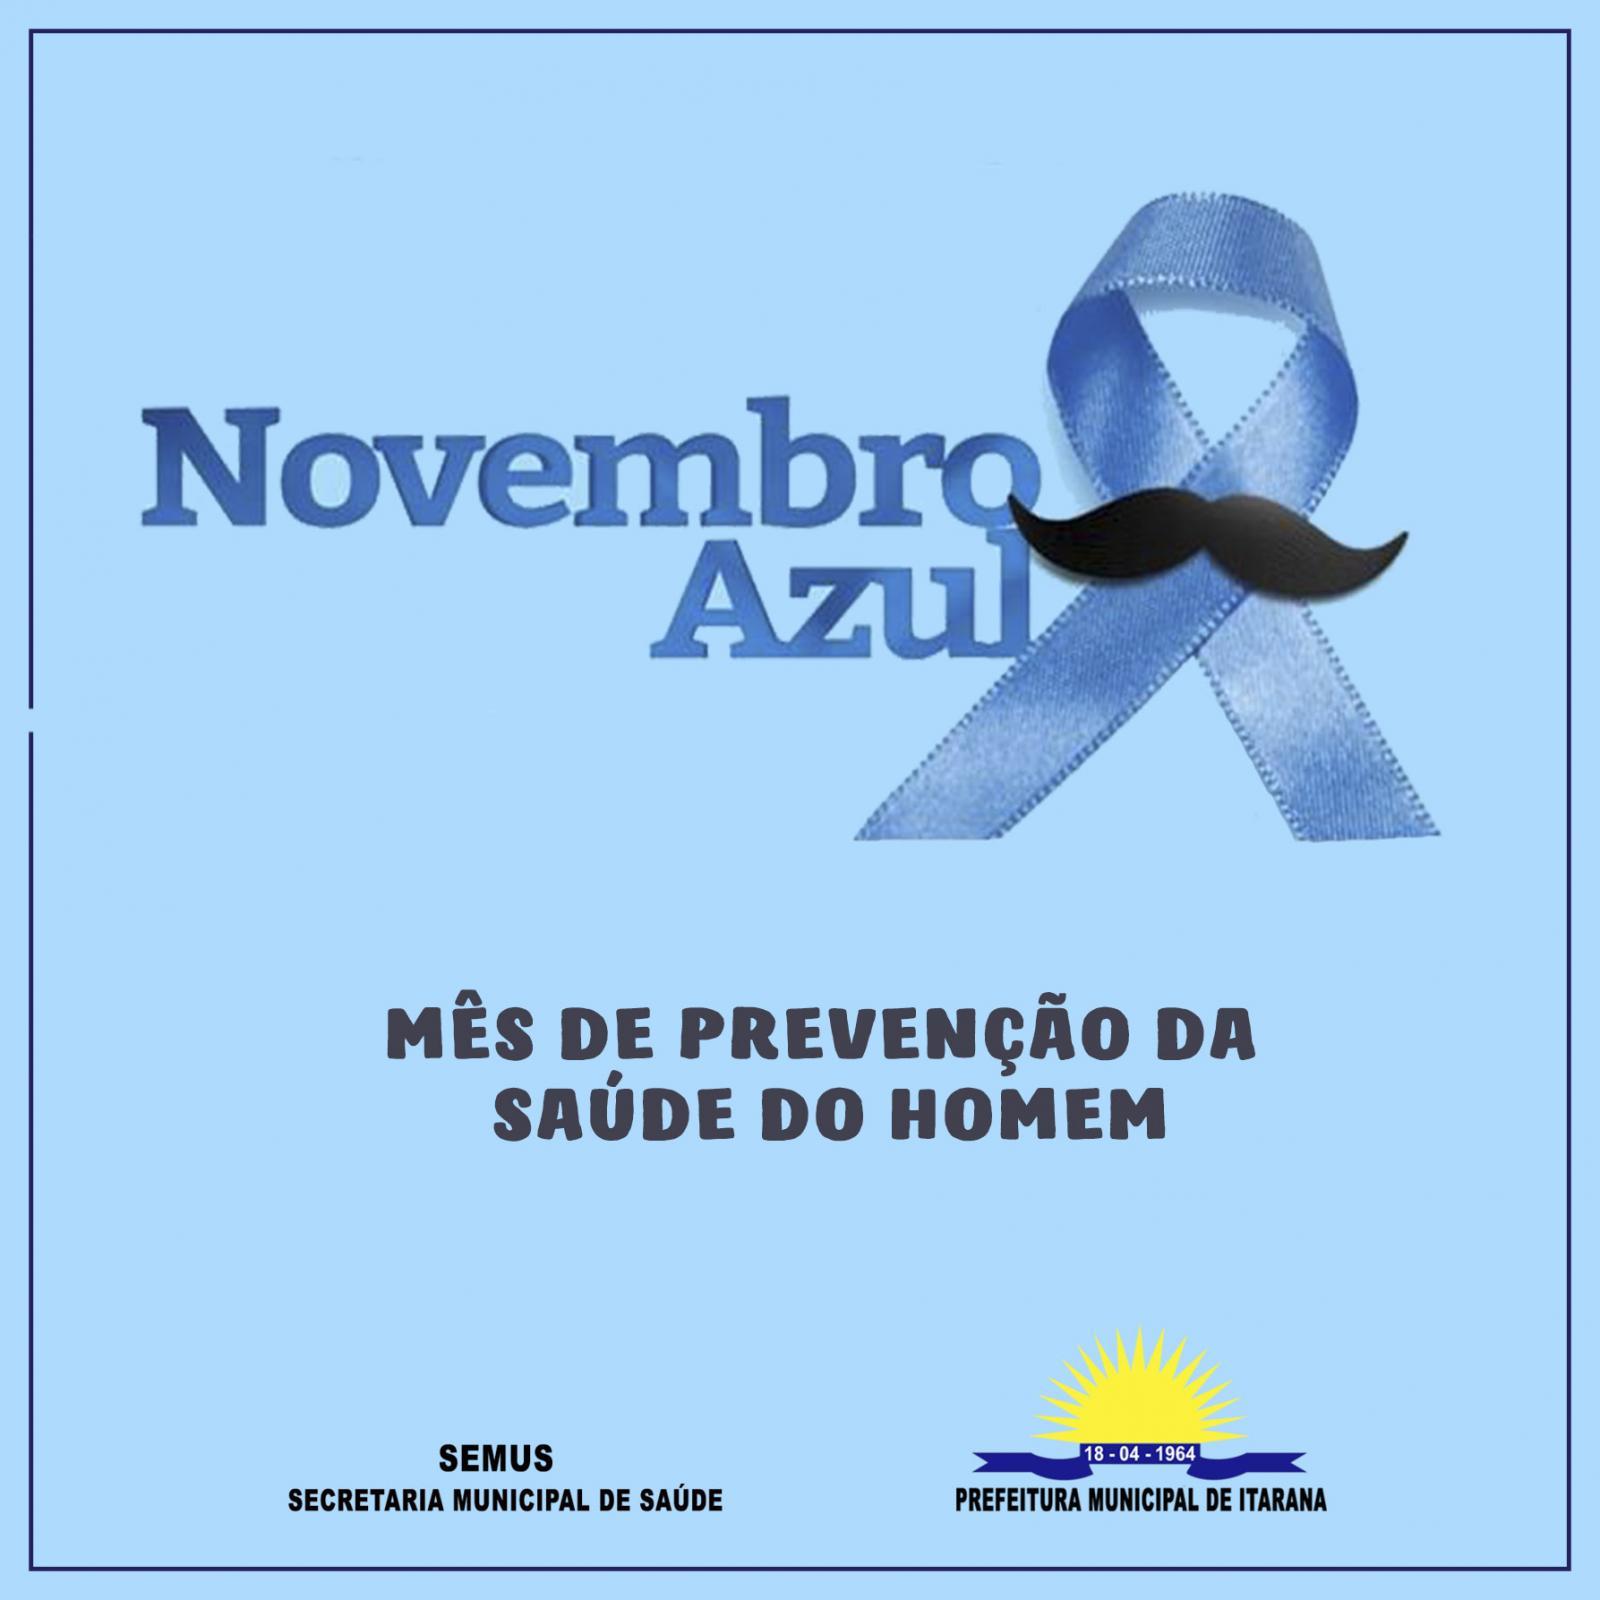 Novembro Azul em Itarana